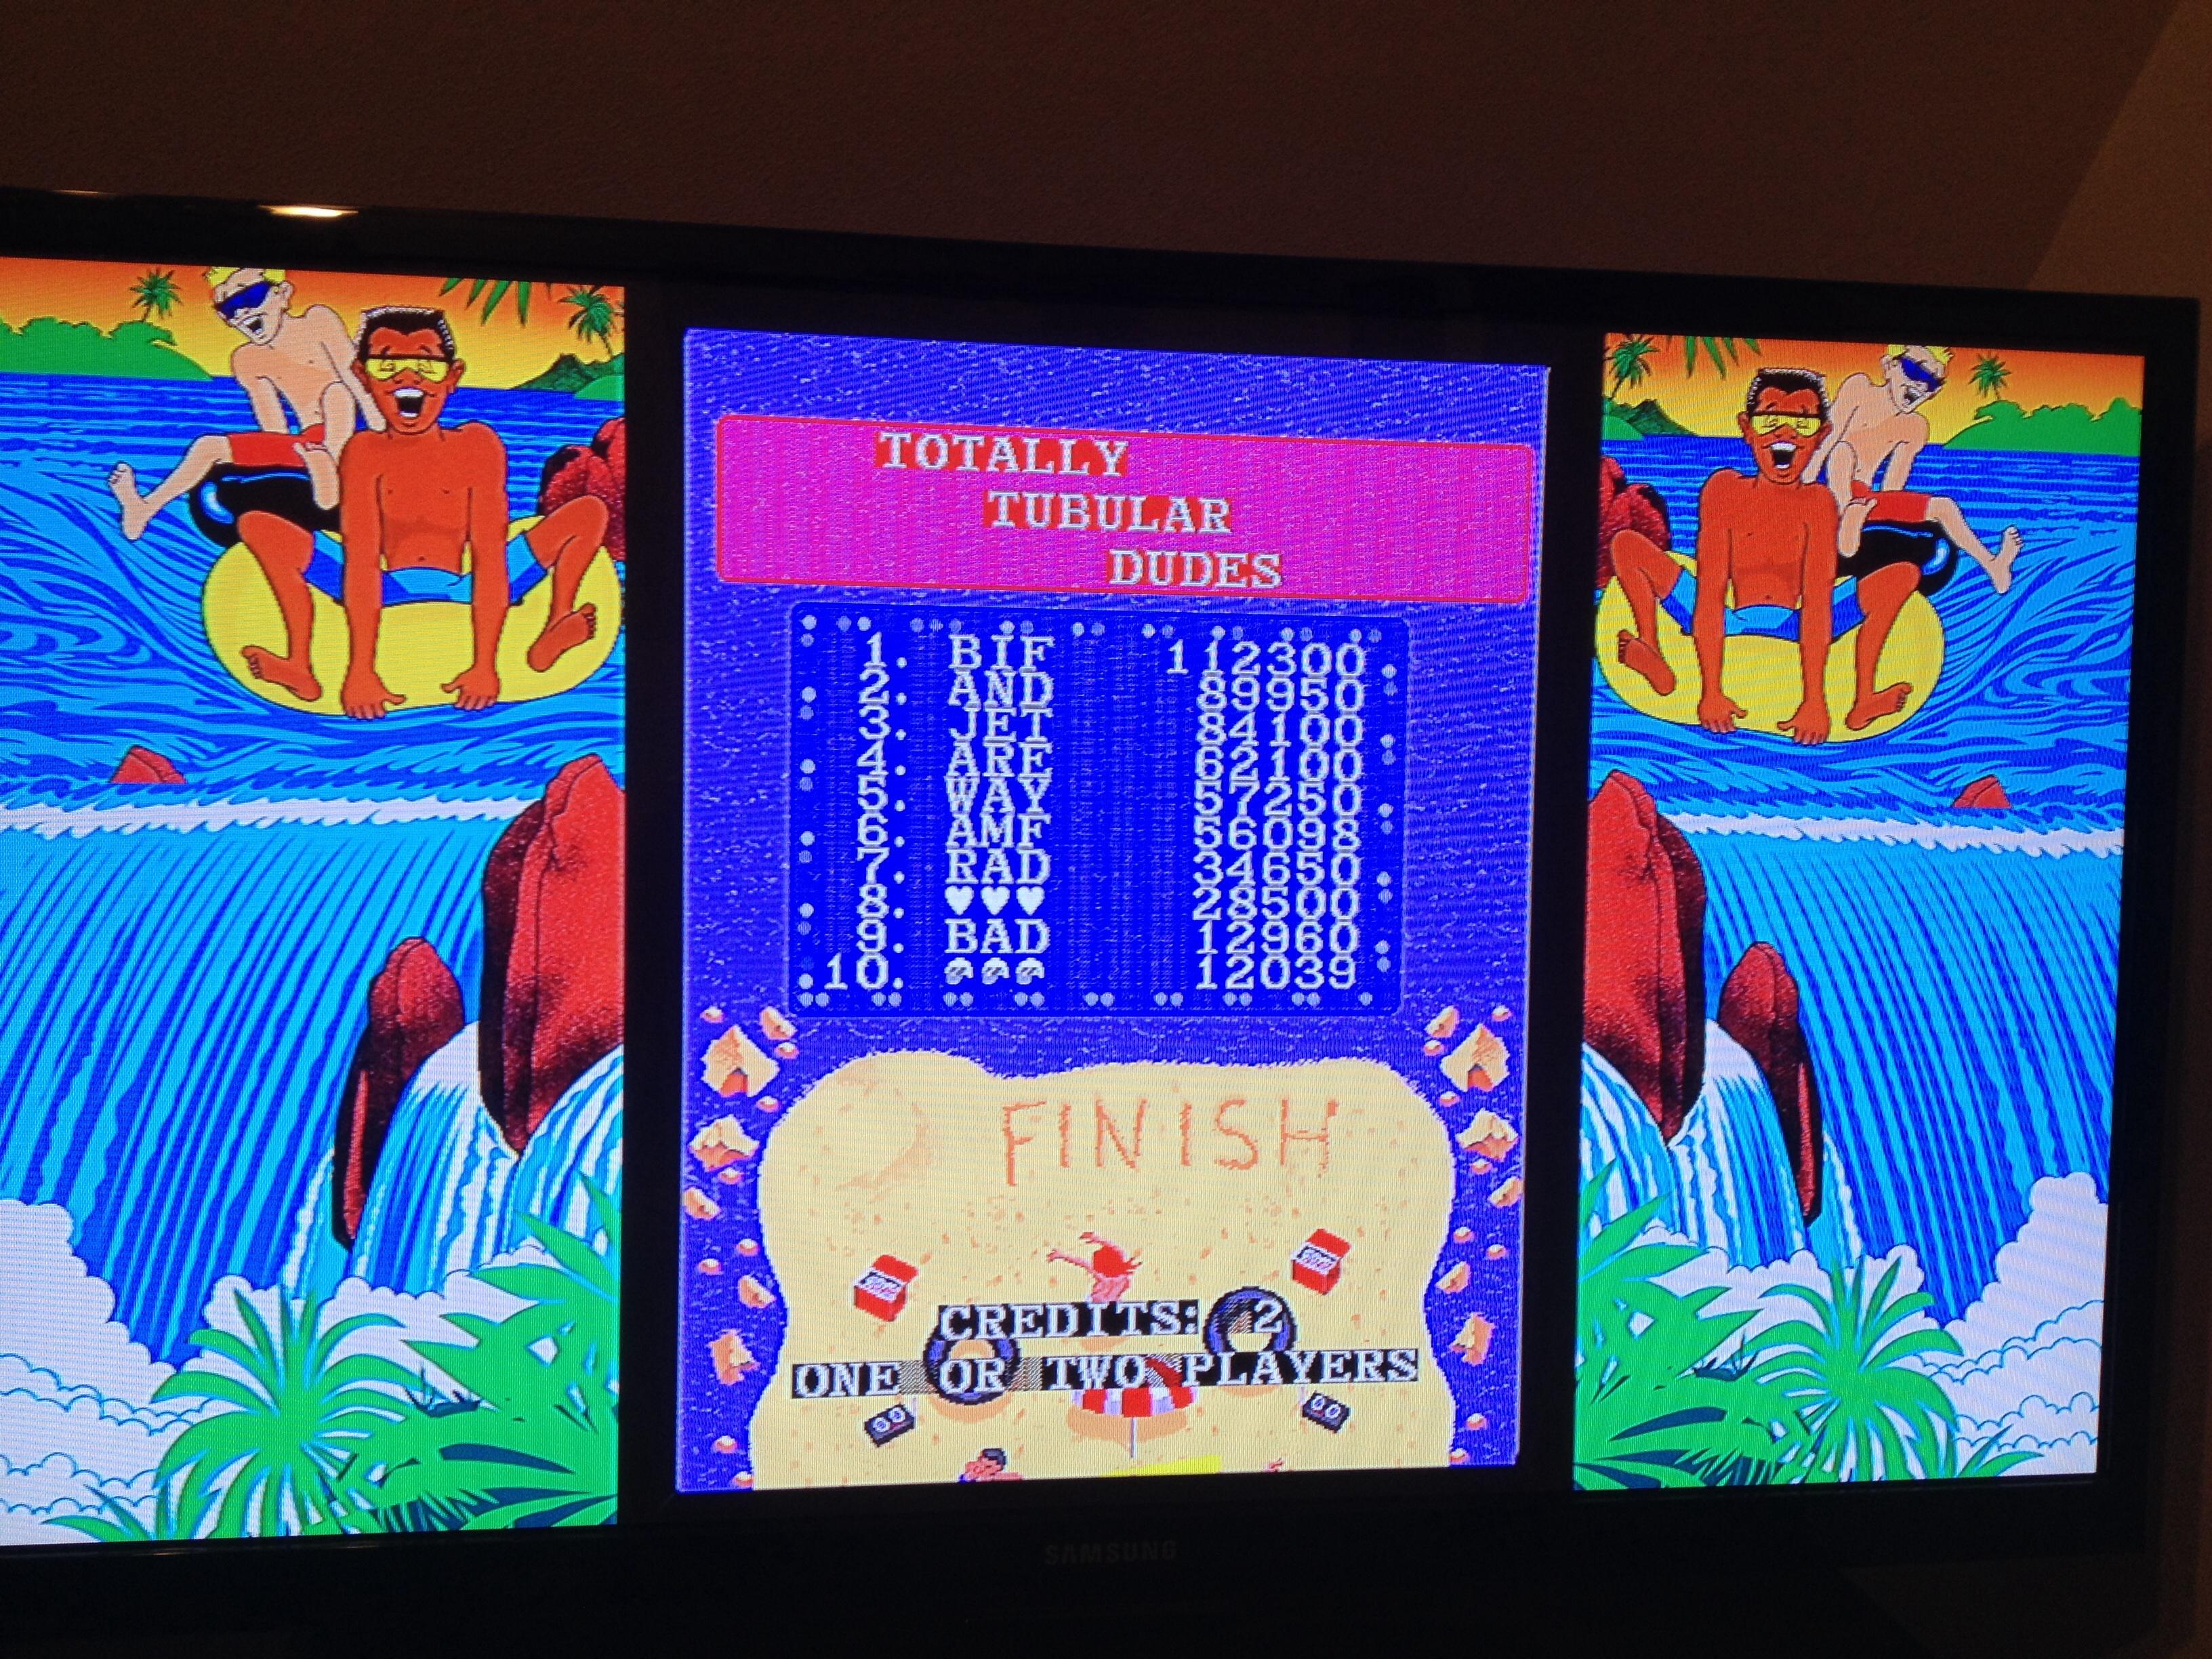 FosterAMF: Midway Arcade Origins: Toobin